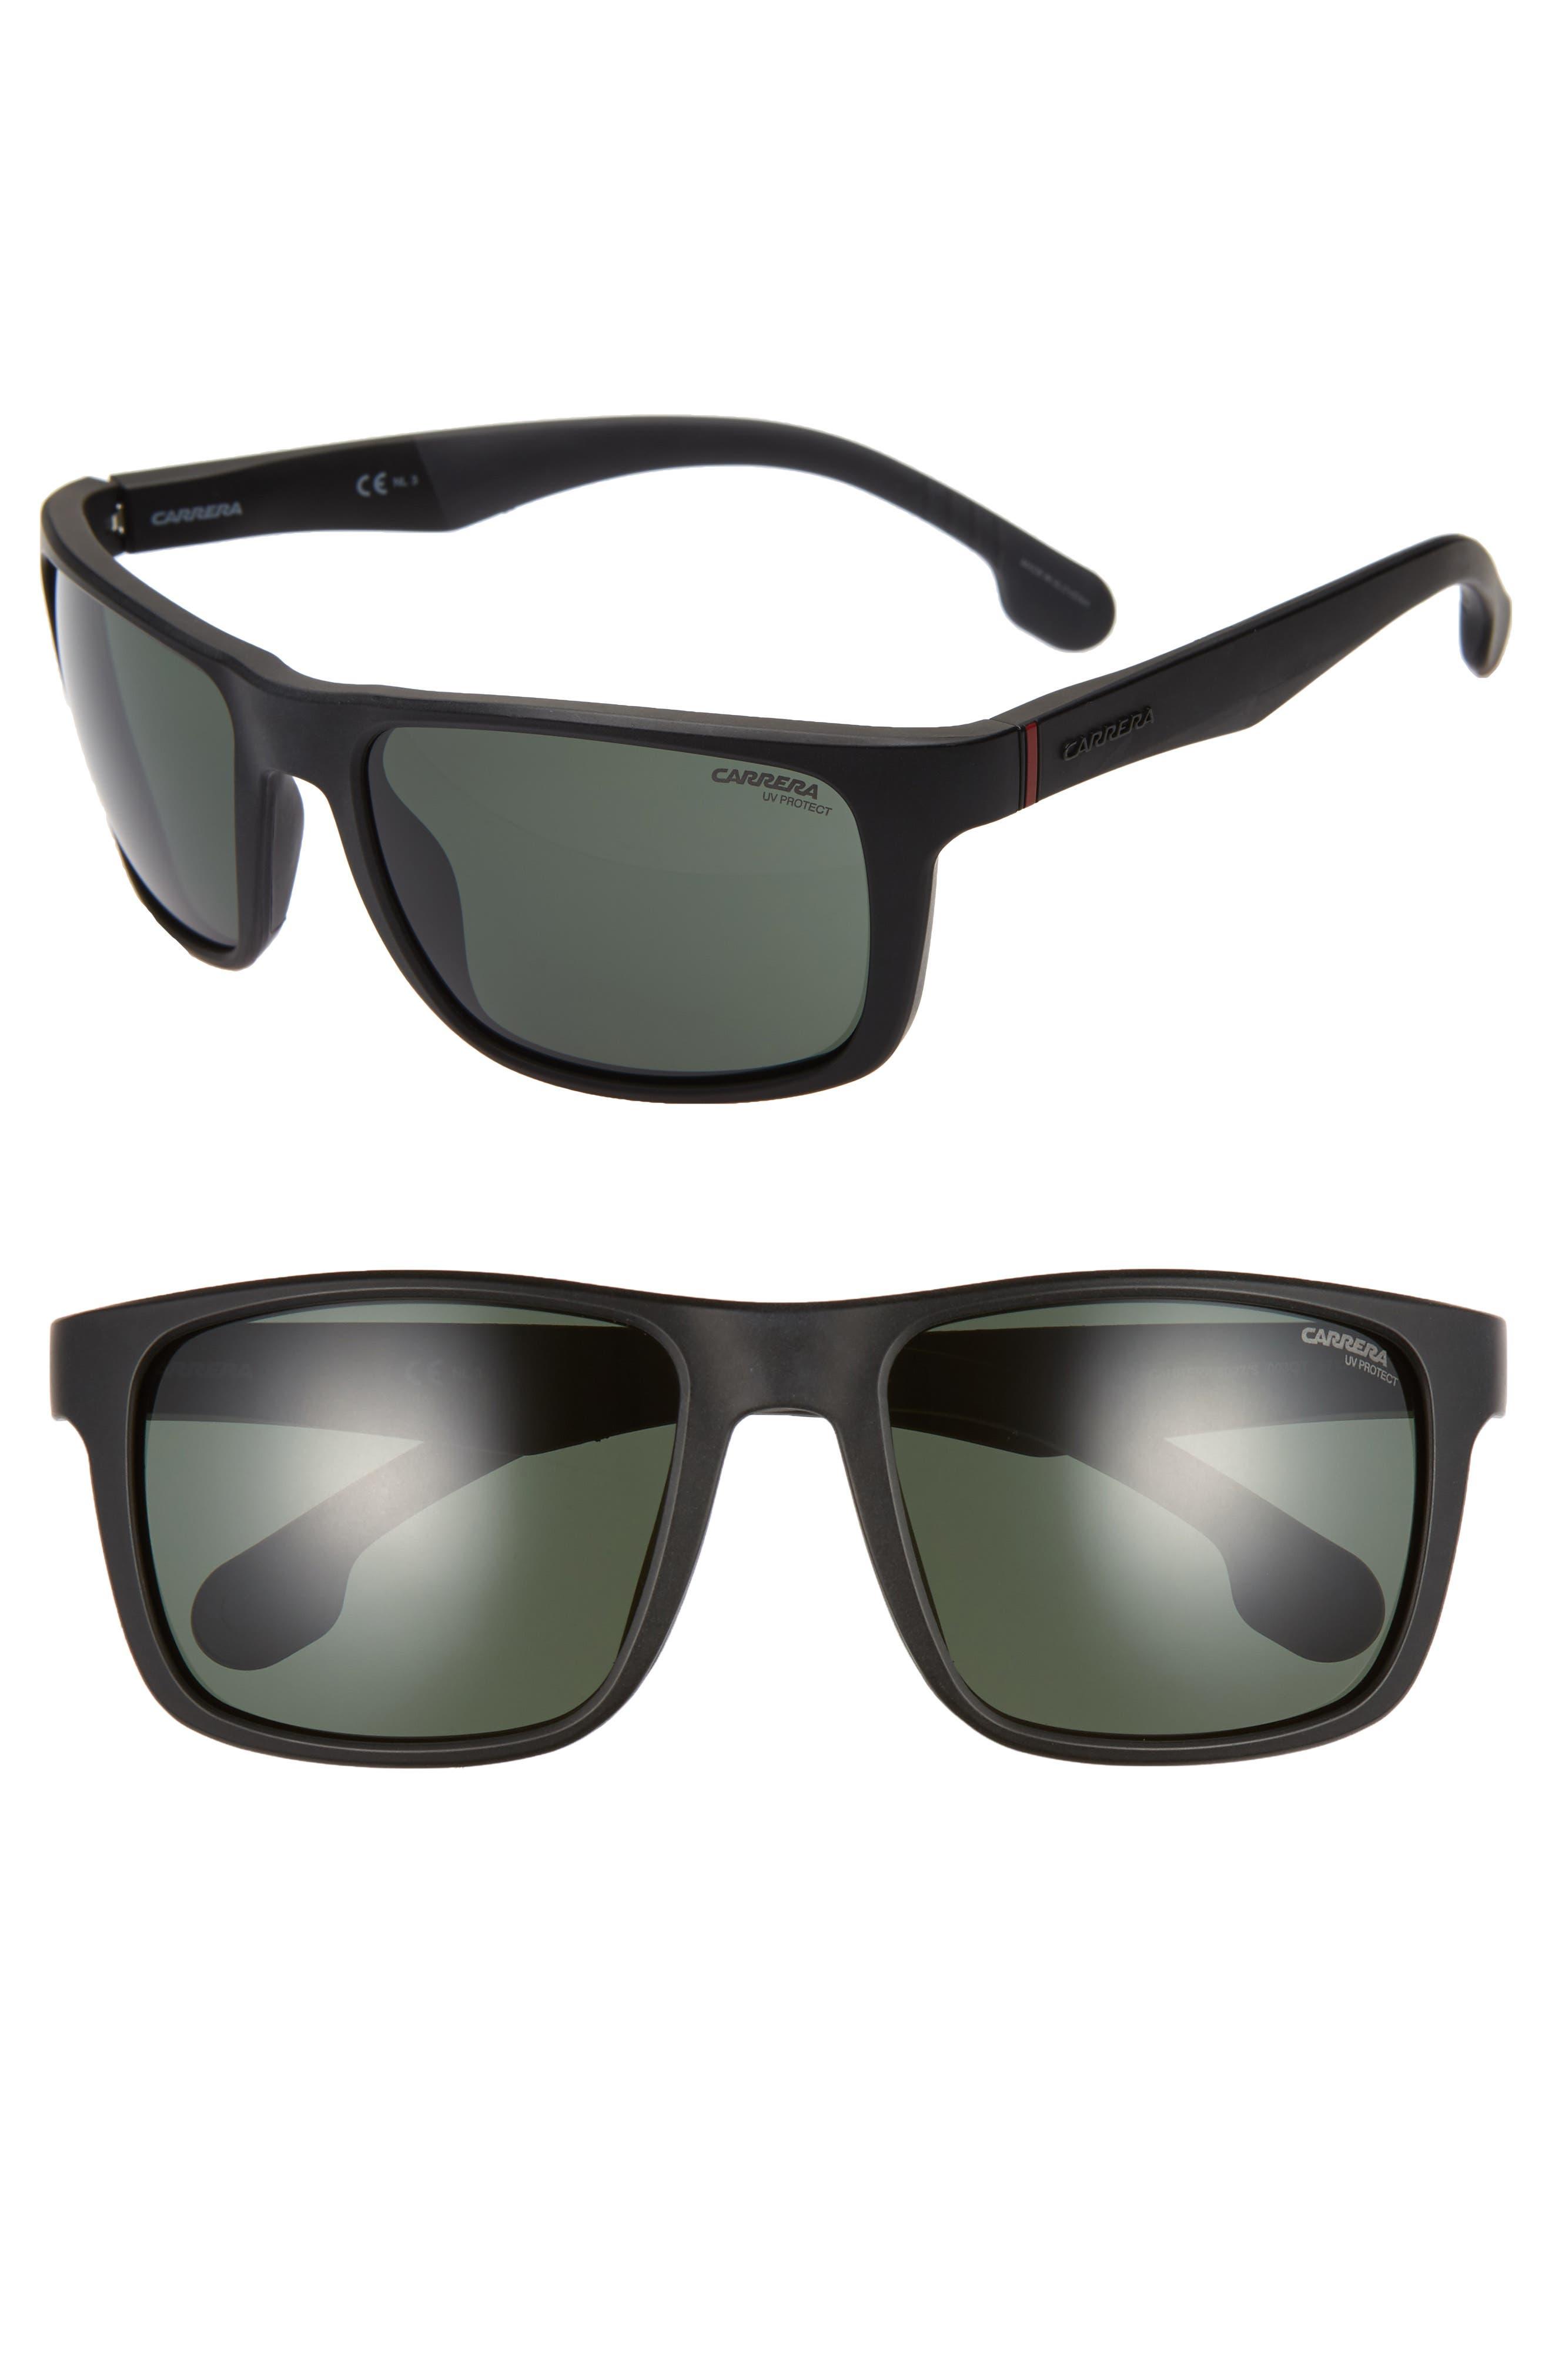 Carrera Eyewear 57Mm Wrap Sunglasses - Matte Black